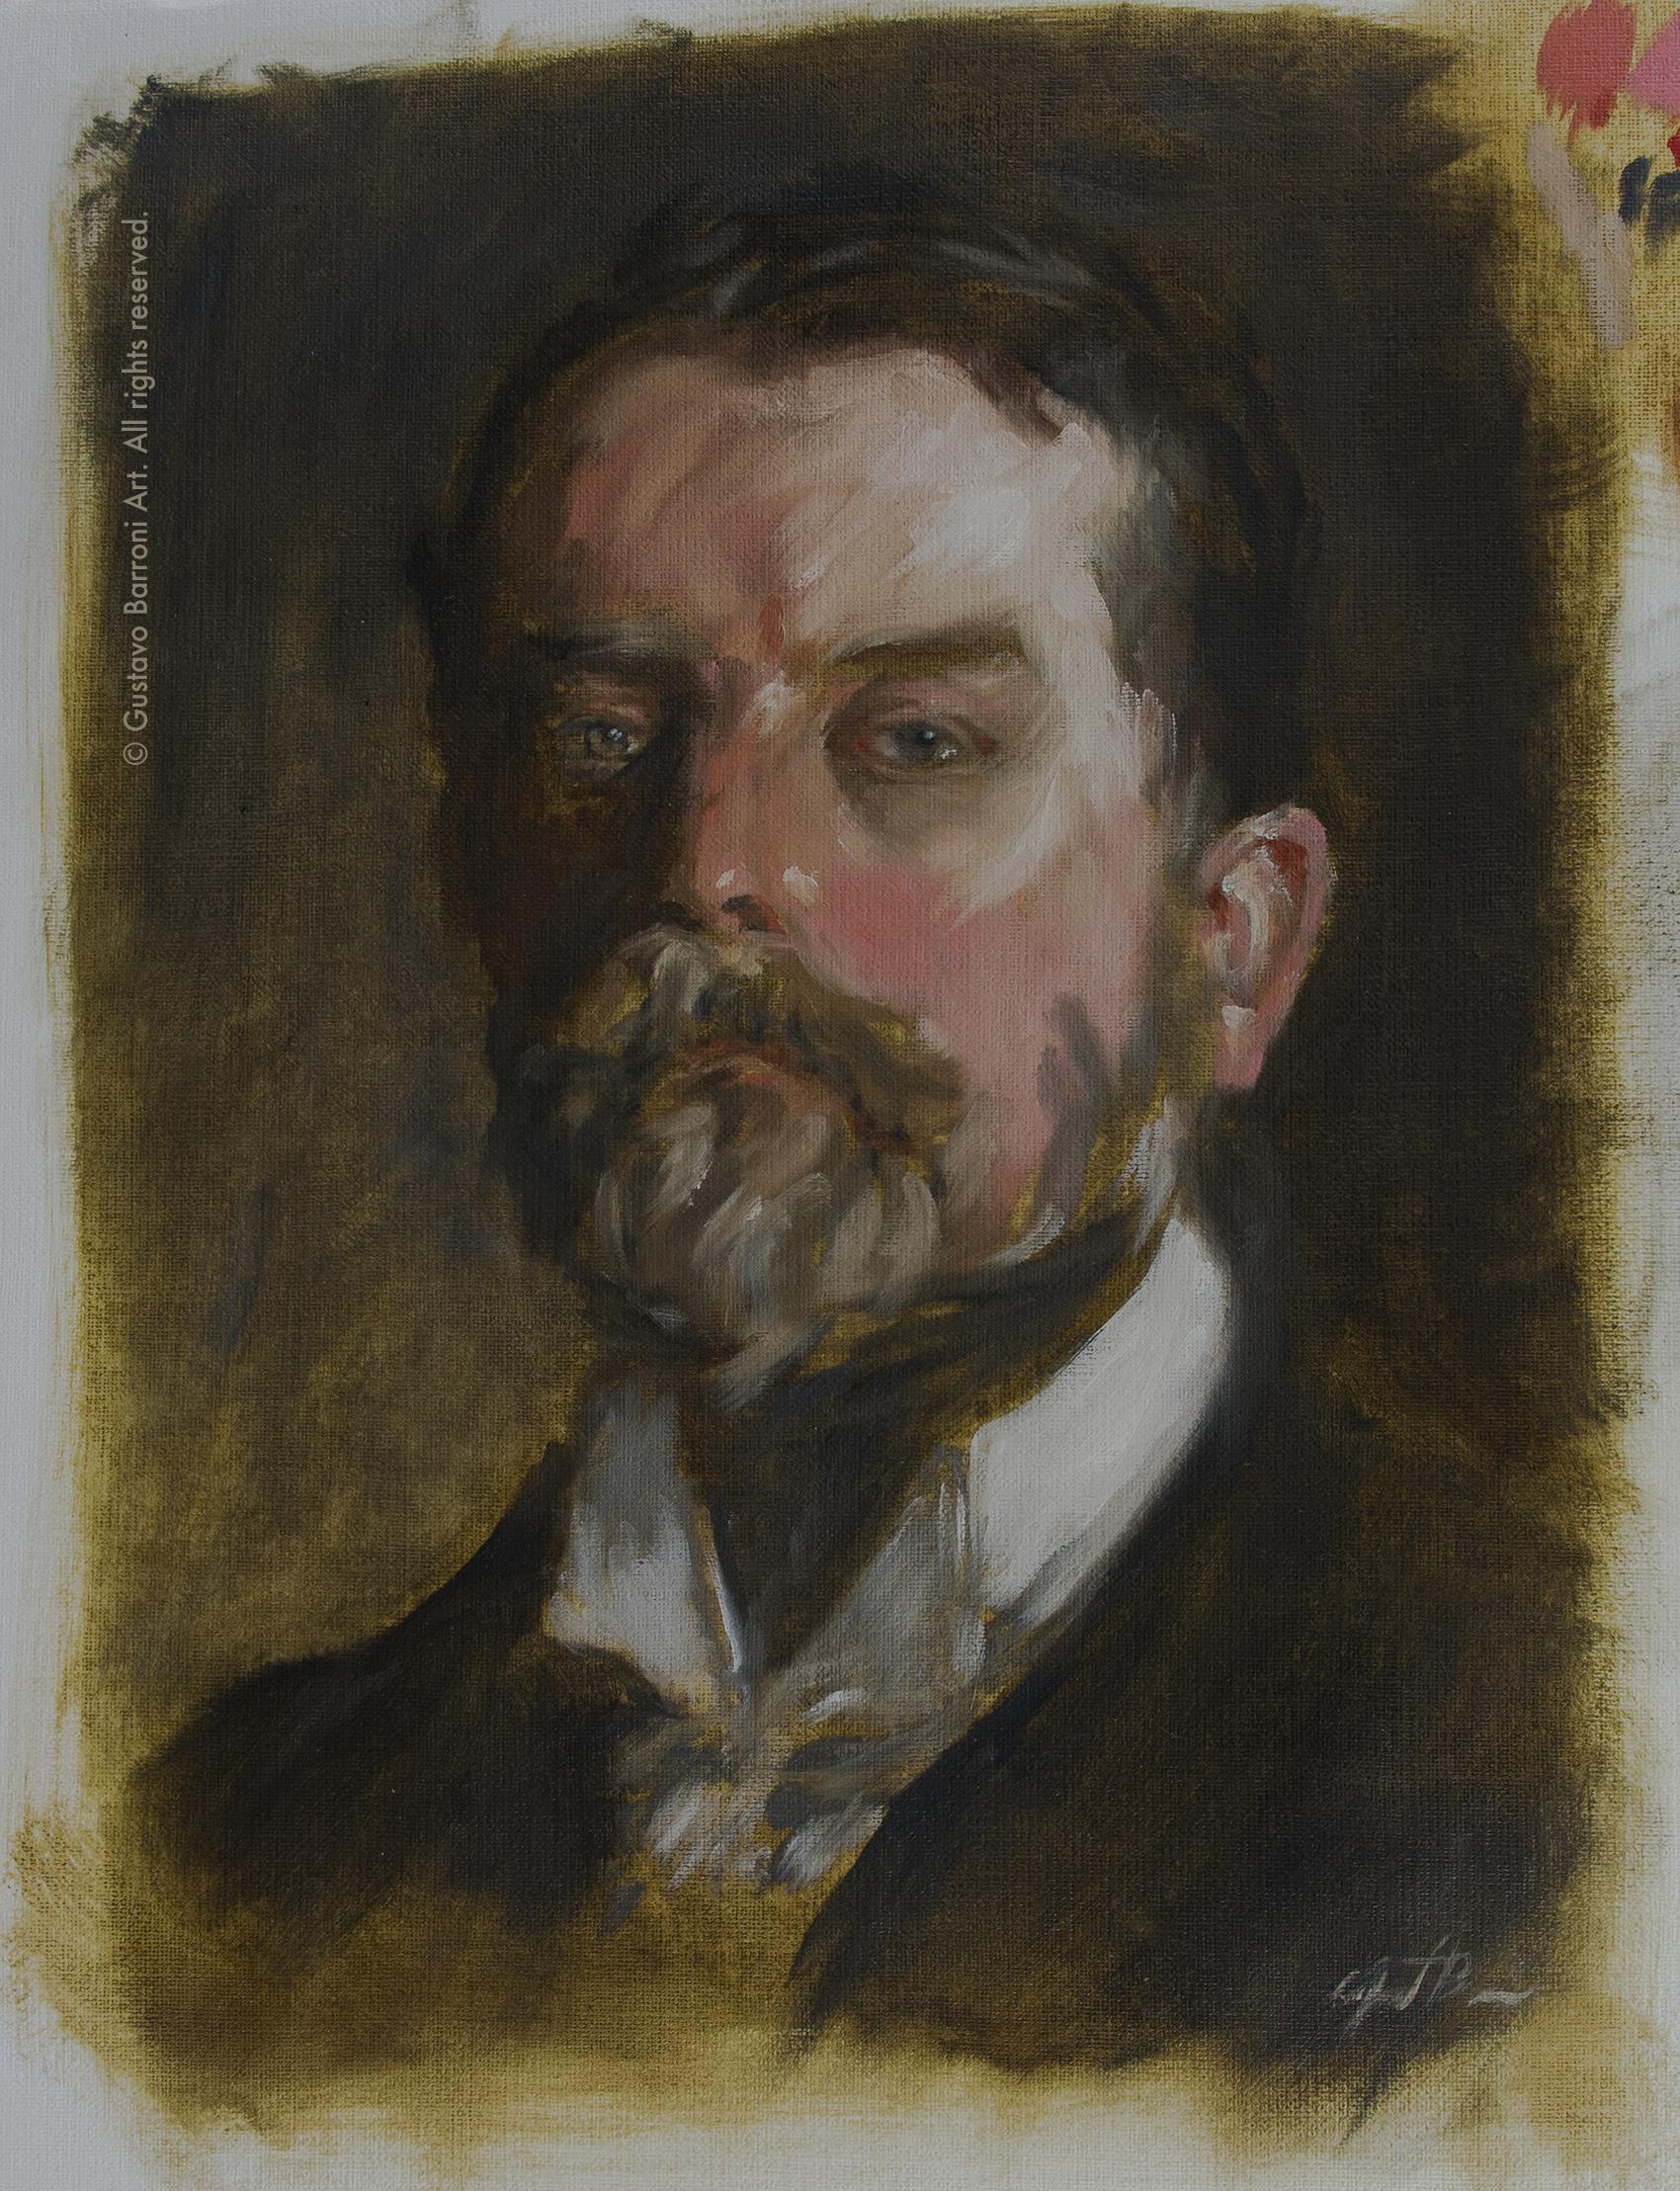 Copy of JOHN SINGER SARGENT PORTRAIT